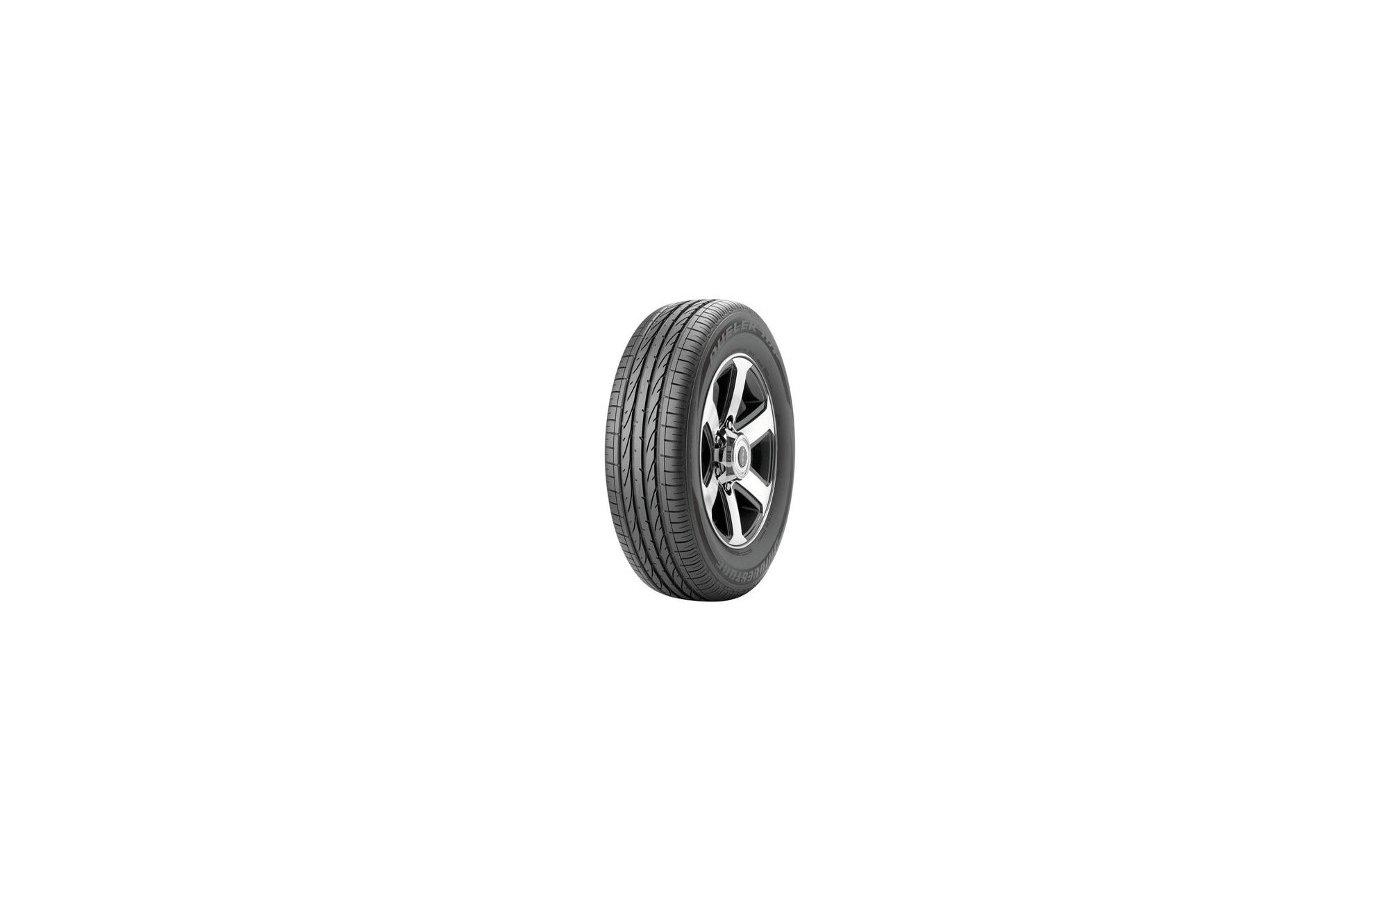 Шина Bridgestone Dueler H/P Sport 215/60 R17 TL 96H